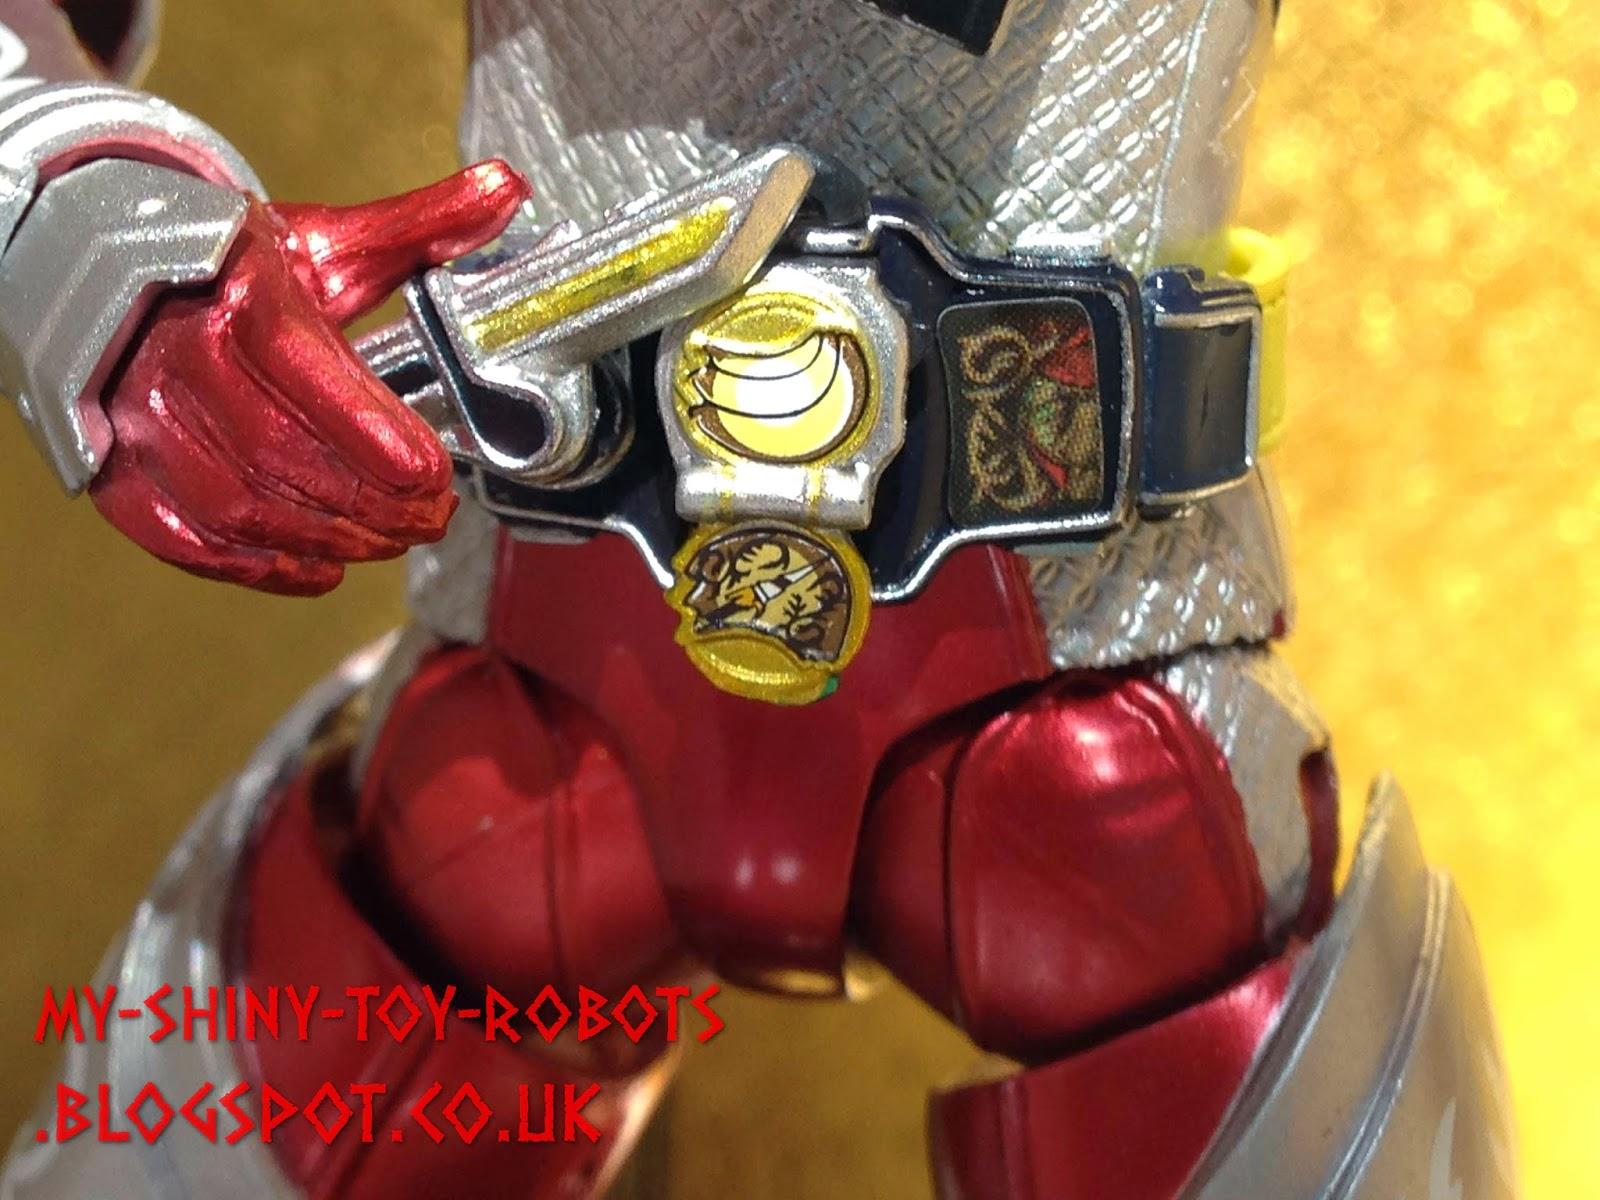 Dat Sengoku Driver detail